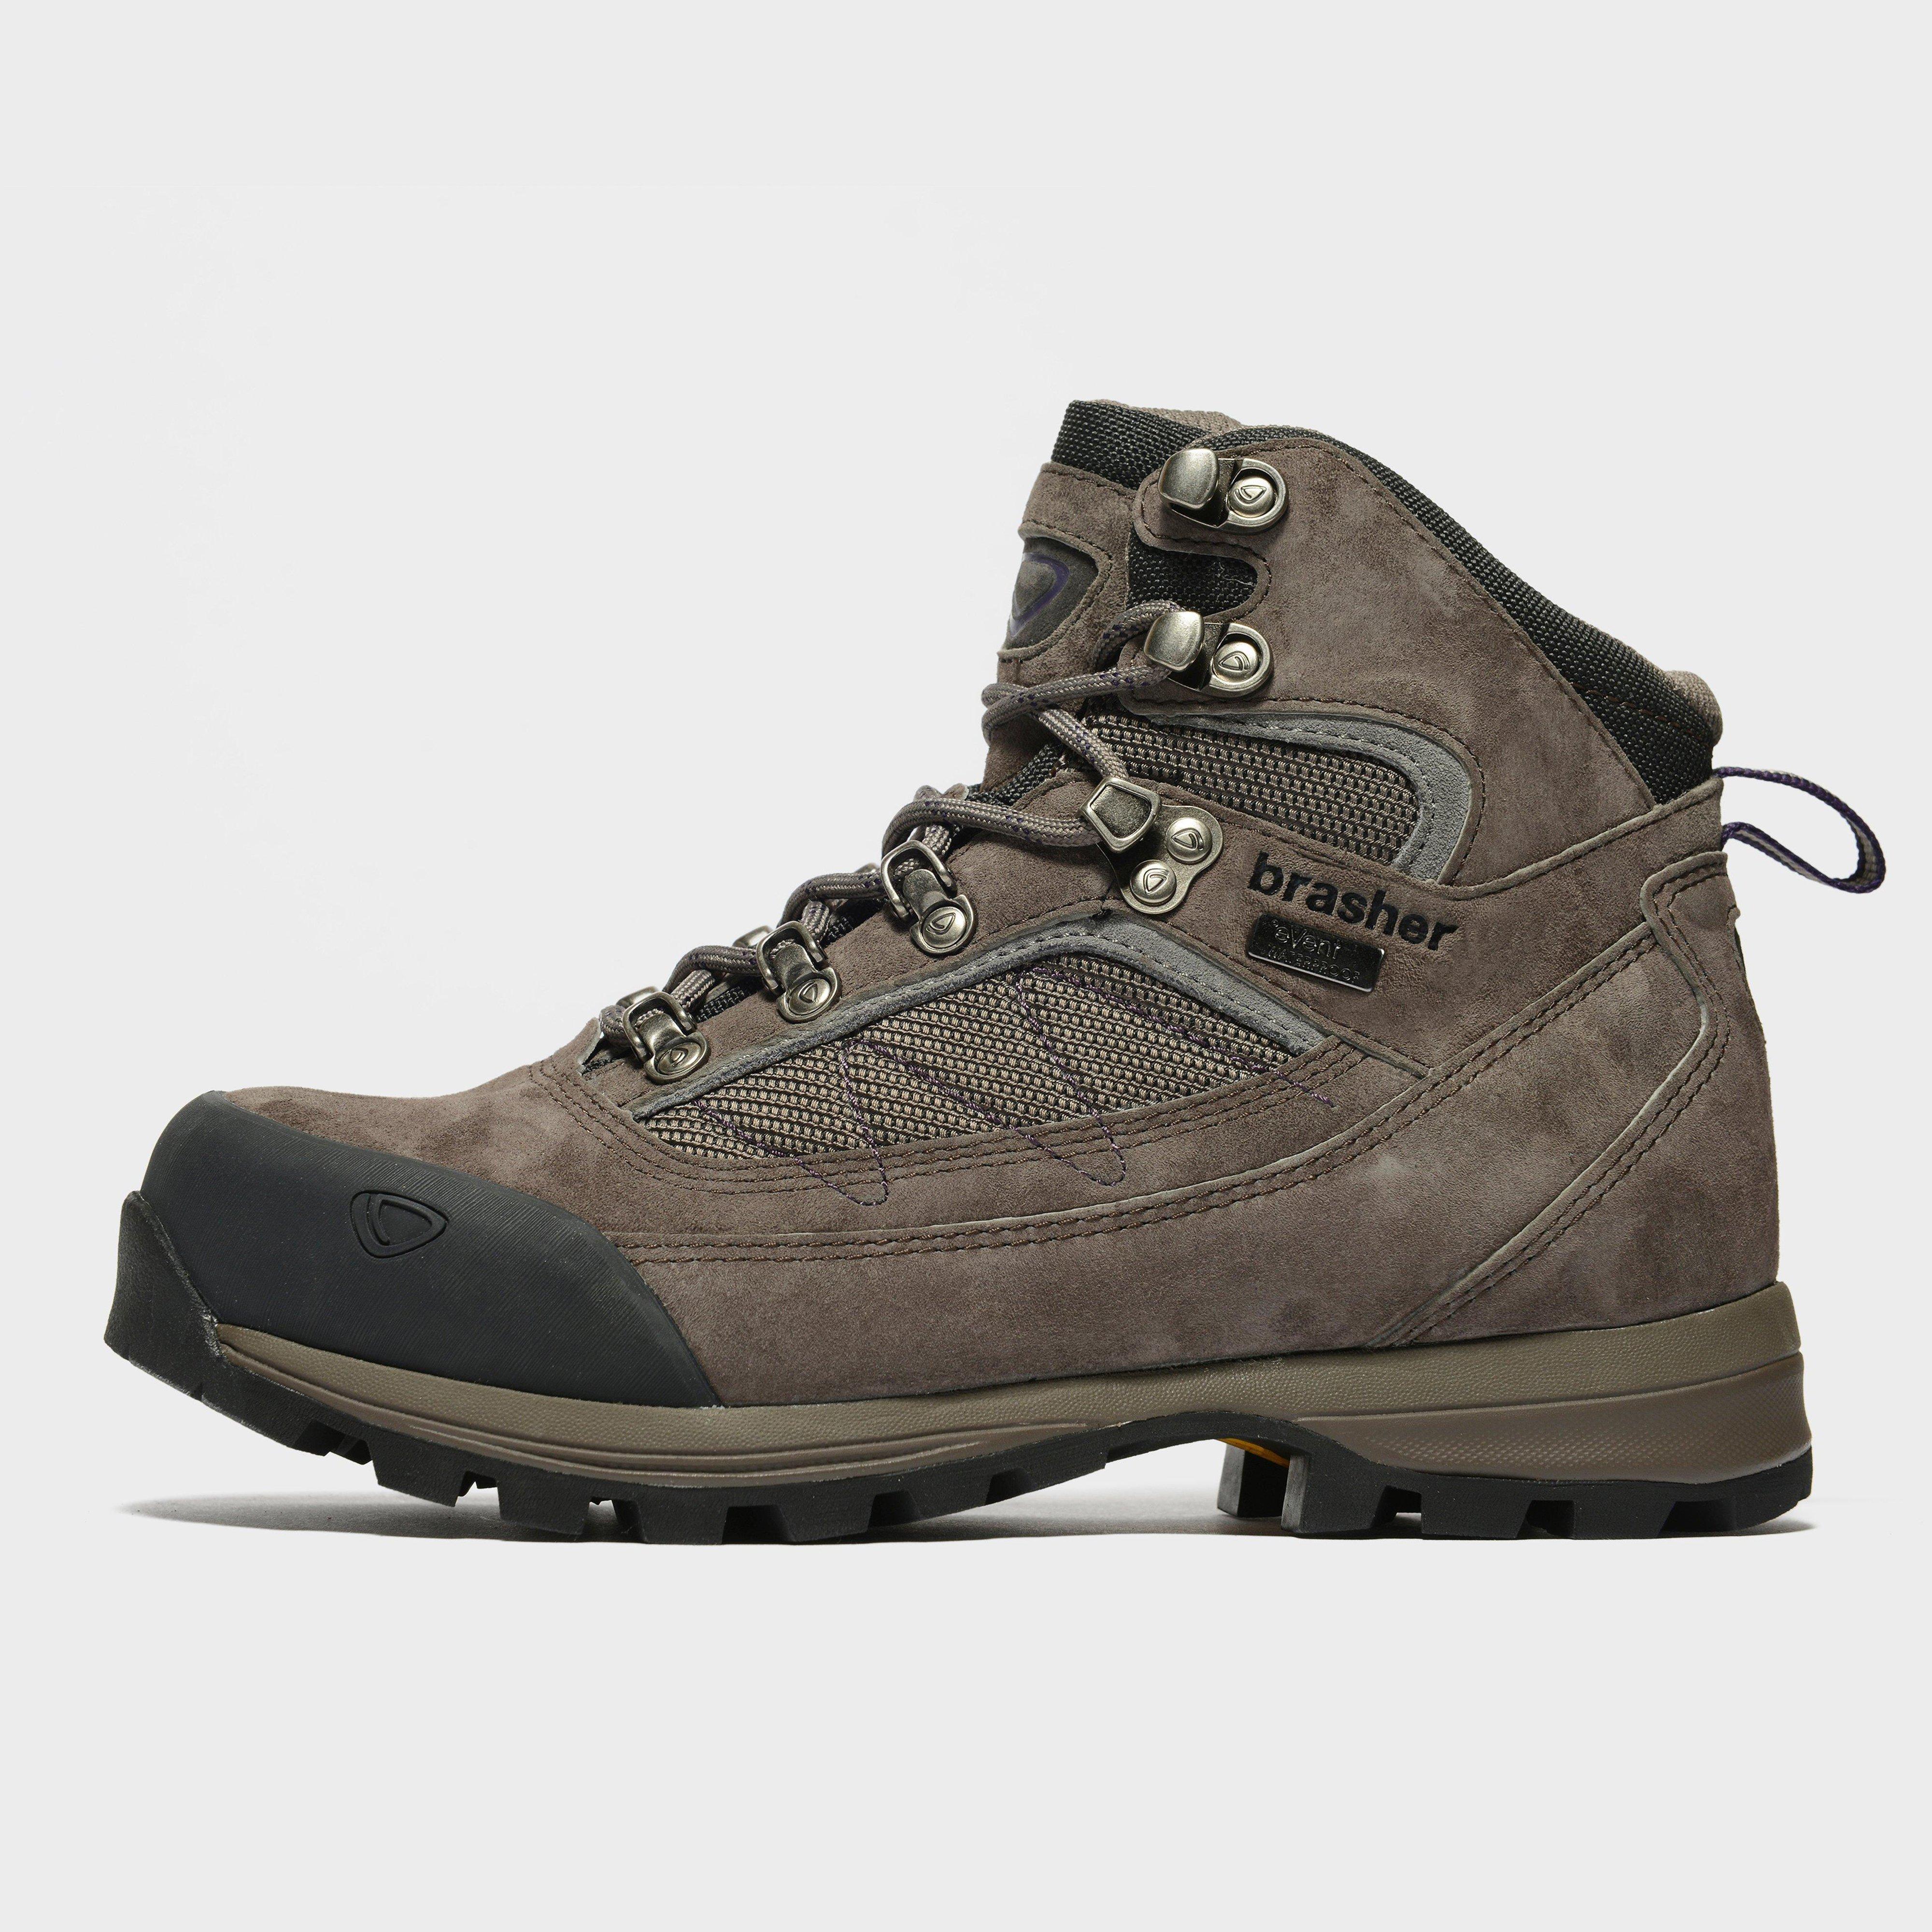 Brasher Brasher Womens Country Trekker Walking Boots - Grey, Grey